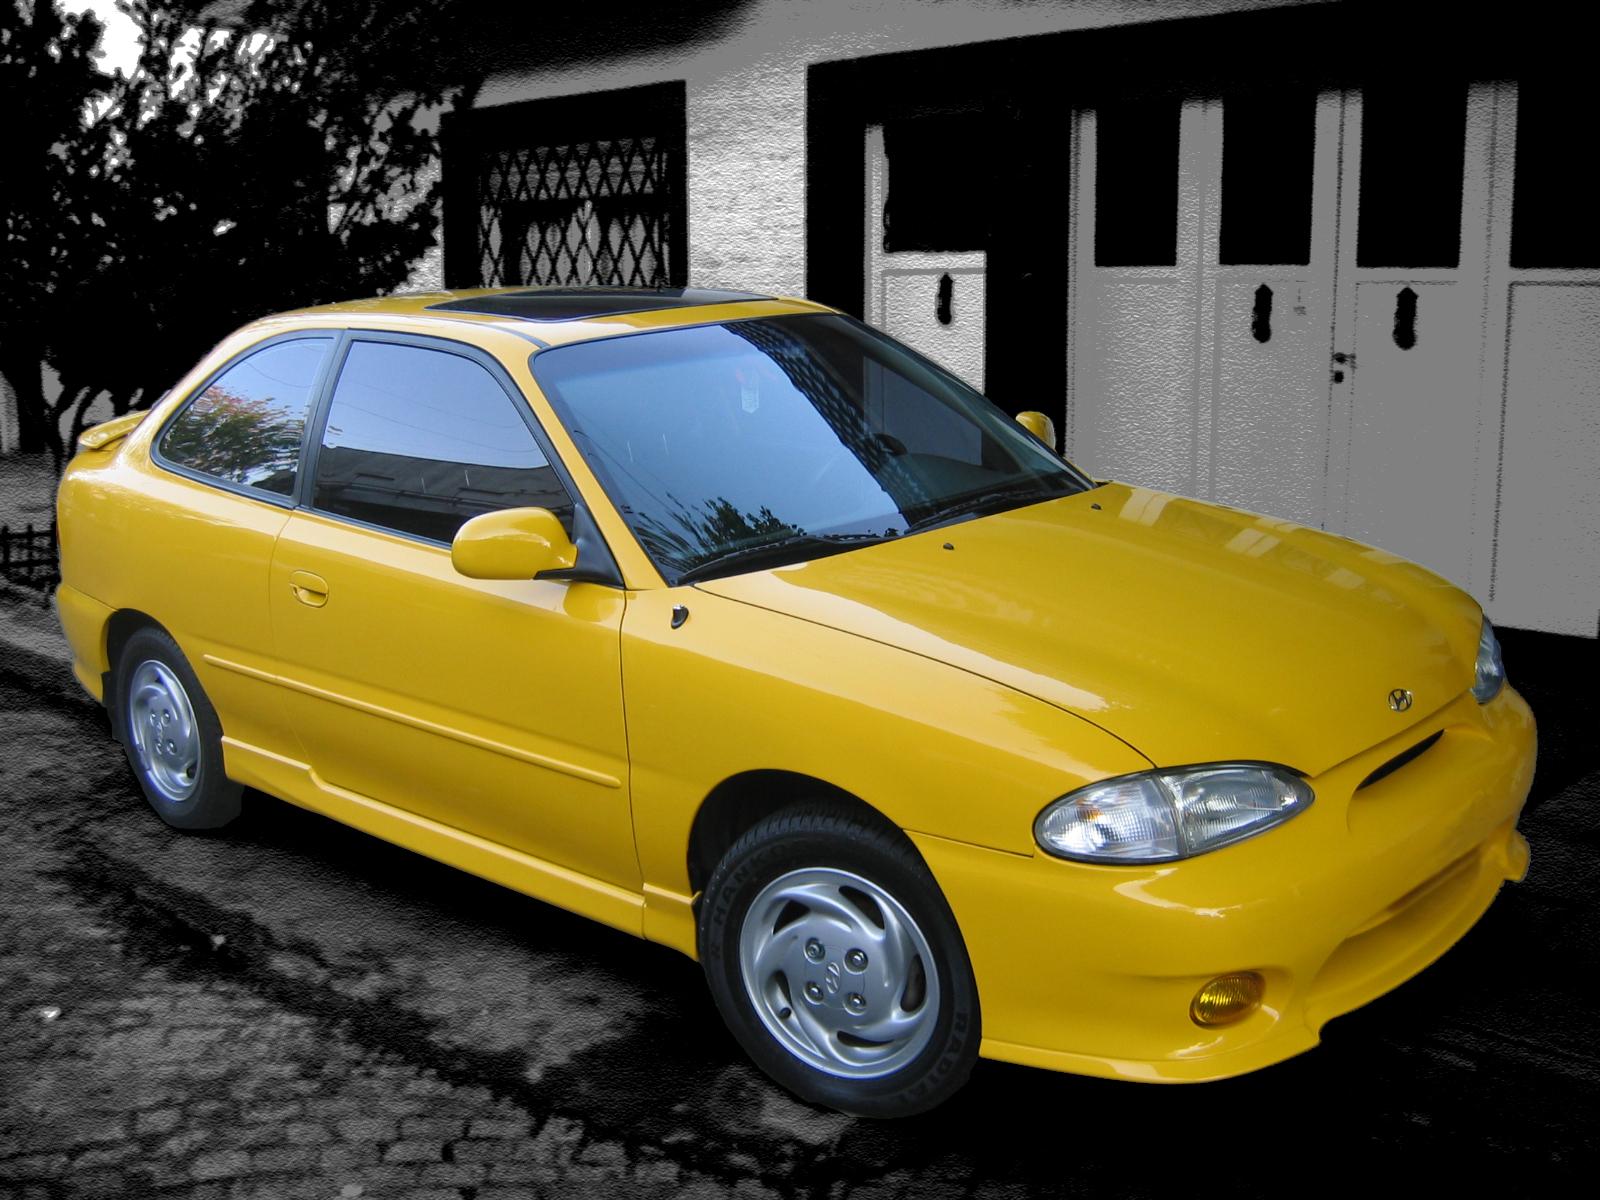 File:Hyundai Accent GT 1999.jpg - Wikimedia Commons